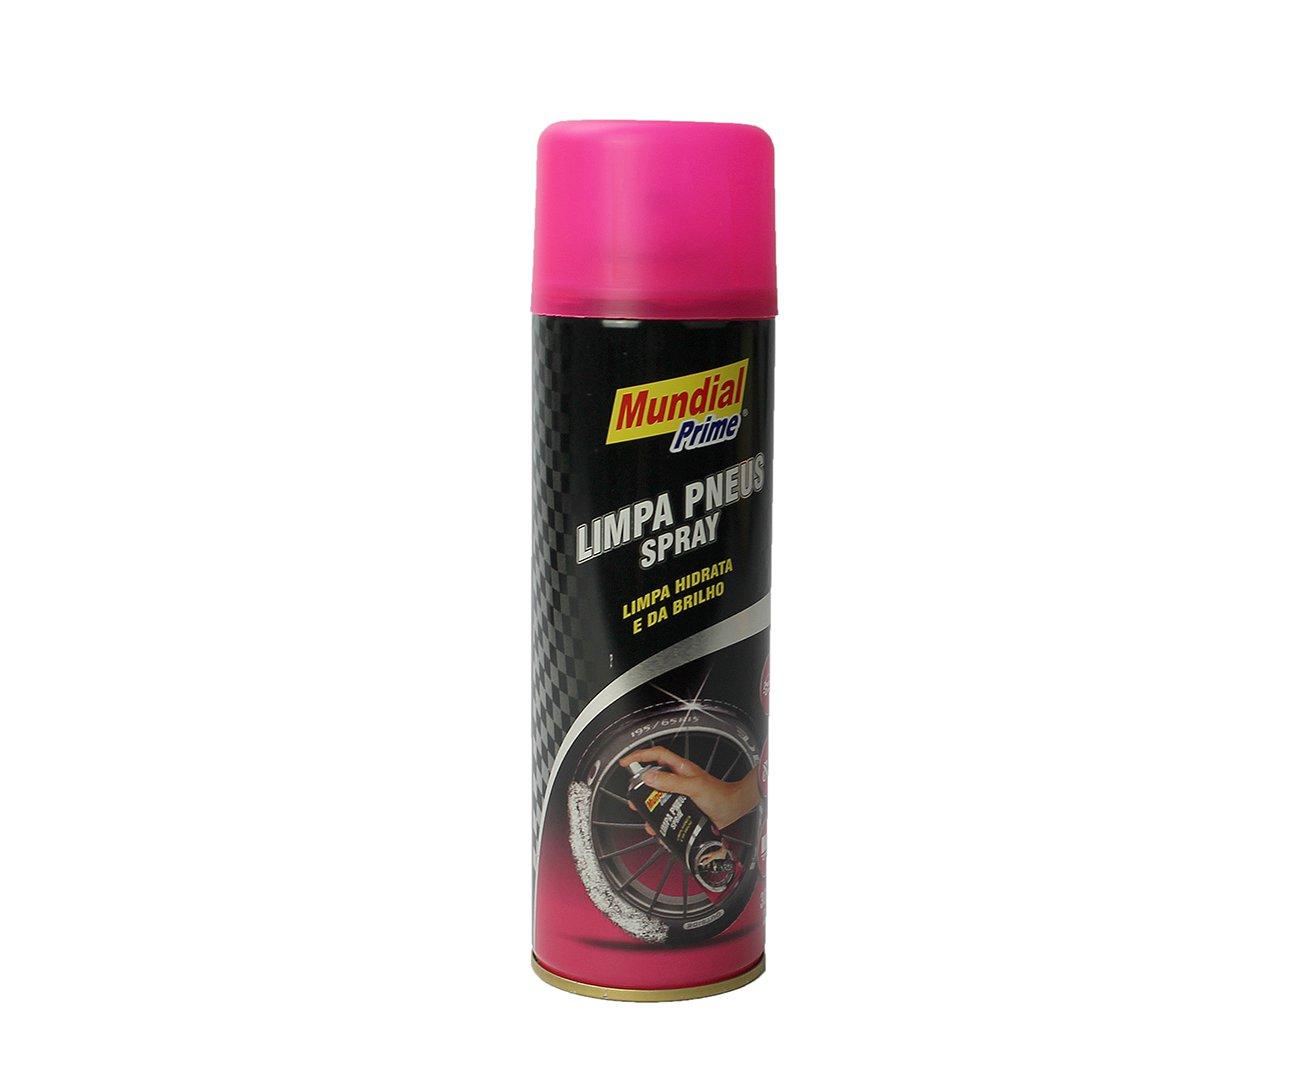 Limpa Pneus Spray 300ml - Mundial Prime